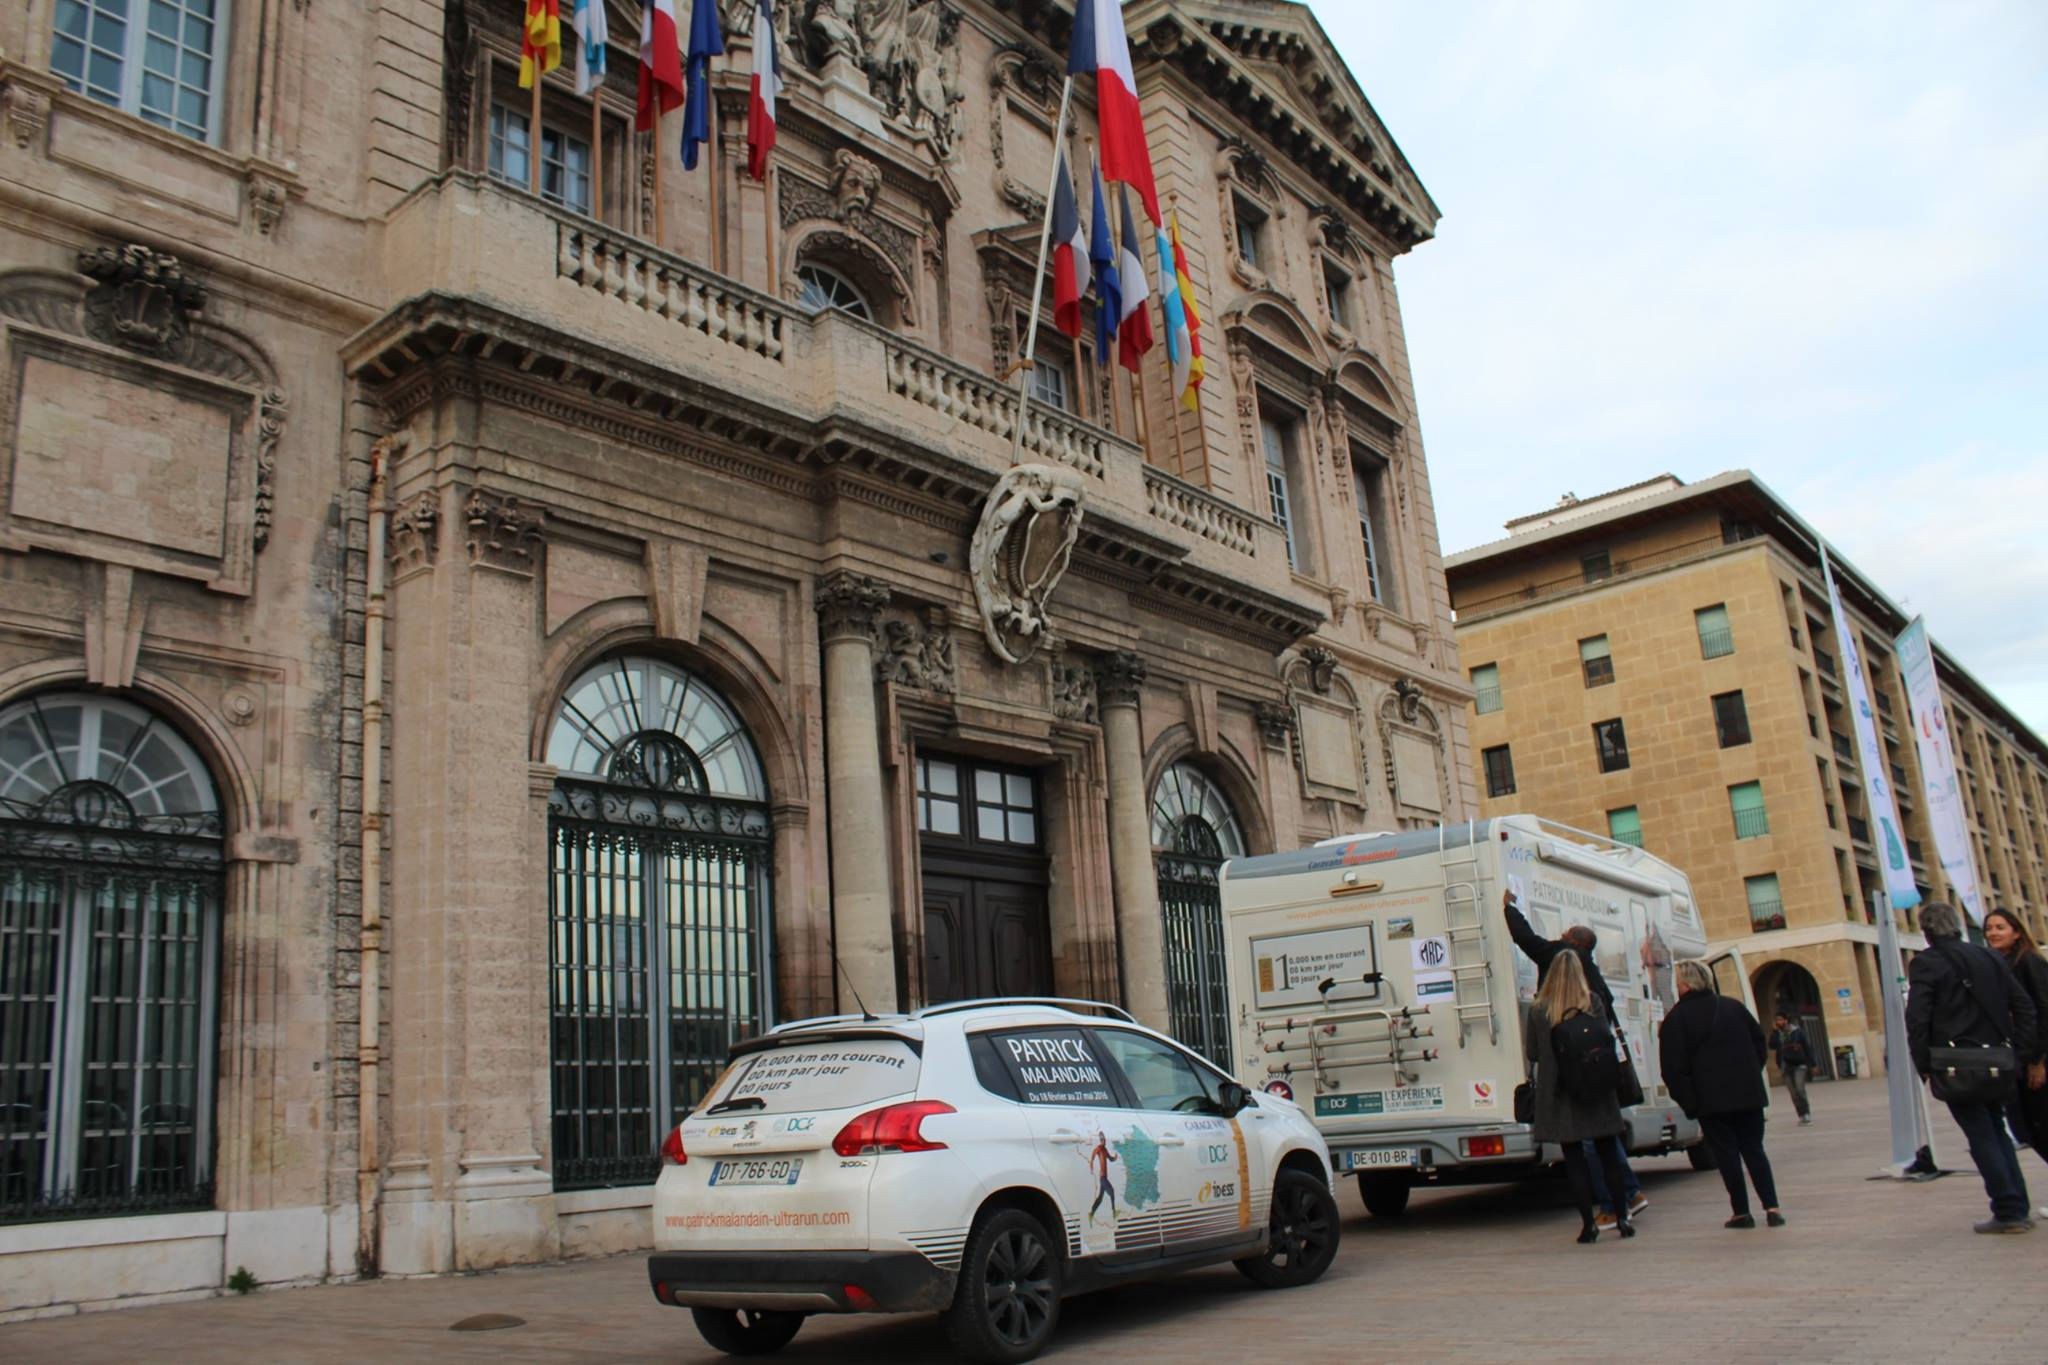 10000 kms etape 40 salon de provence marseille patrick malandain coureur longue distance - Marseille salon de provence ...